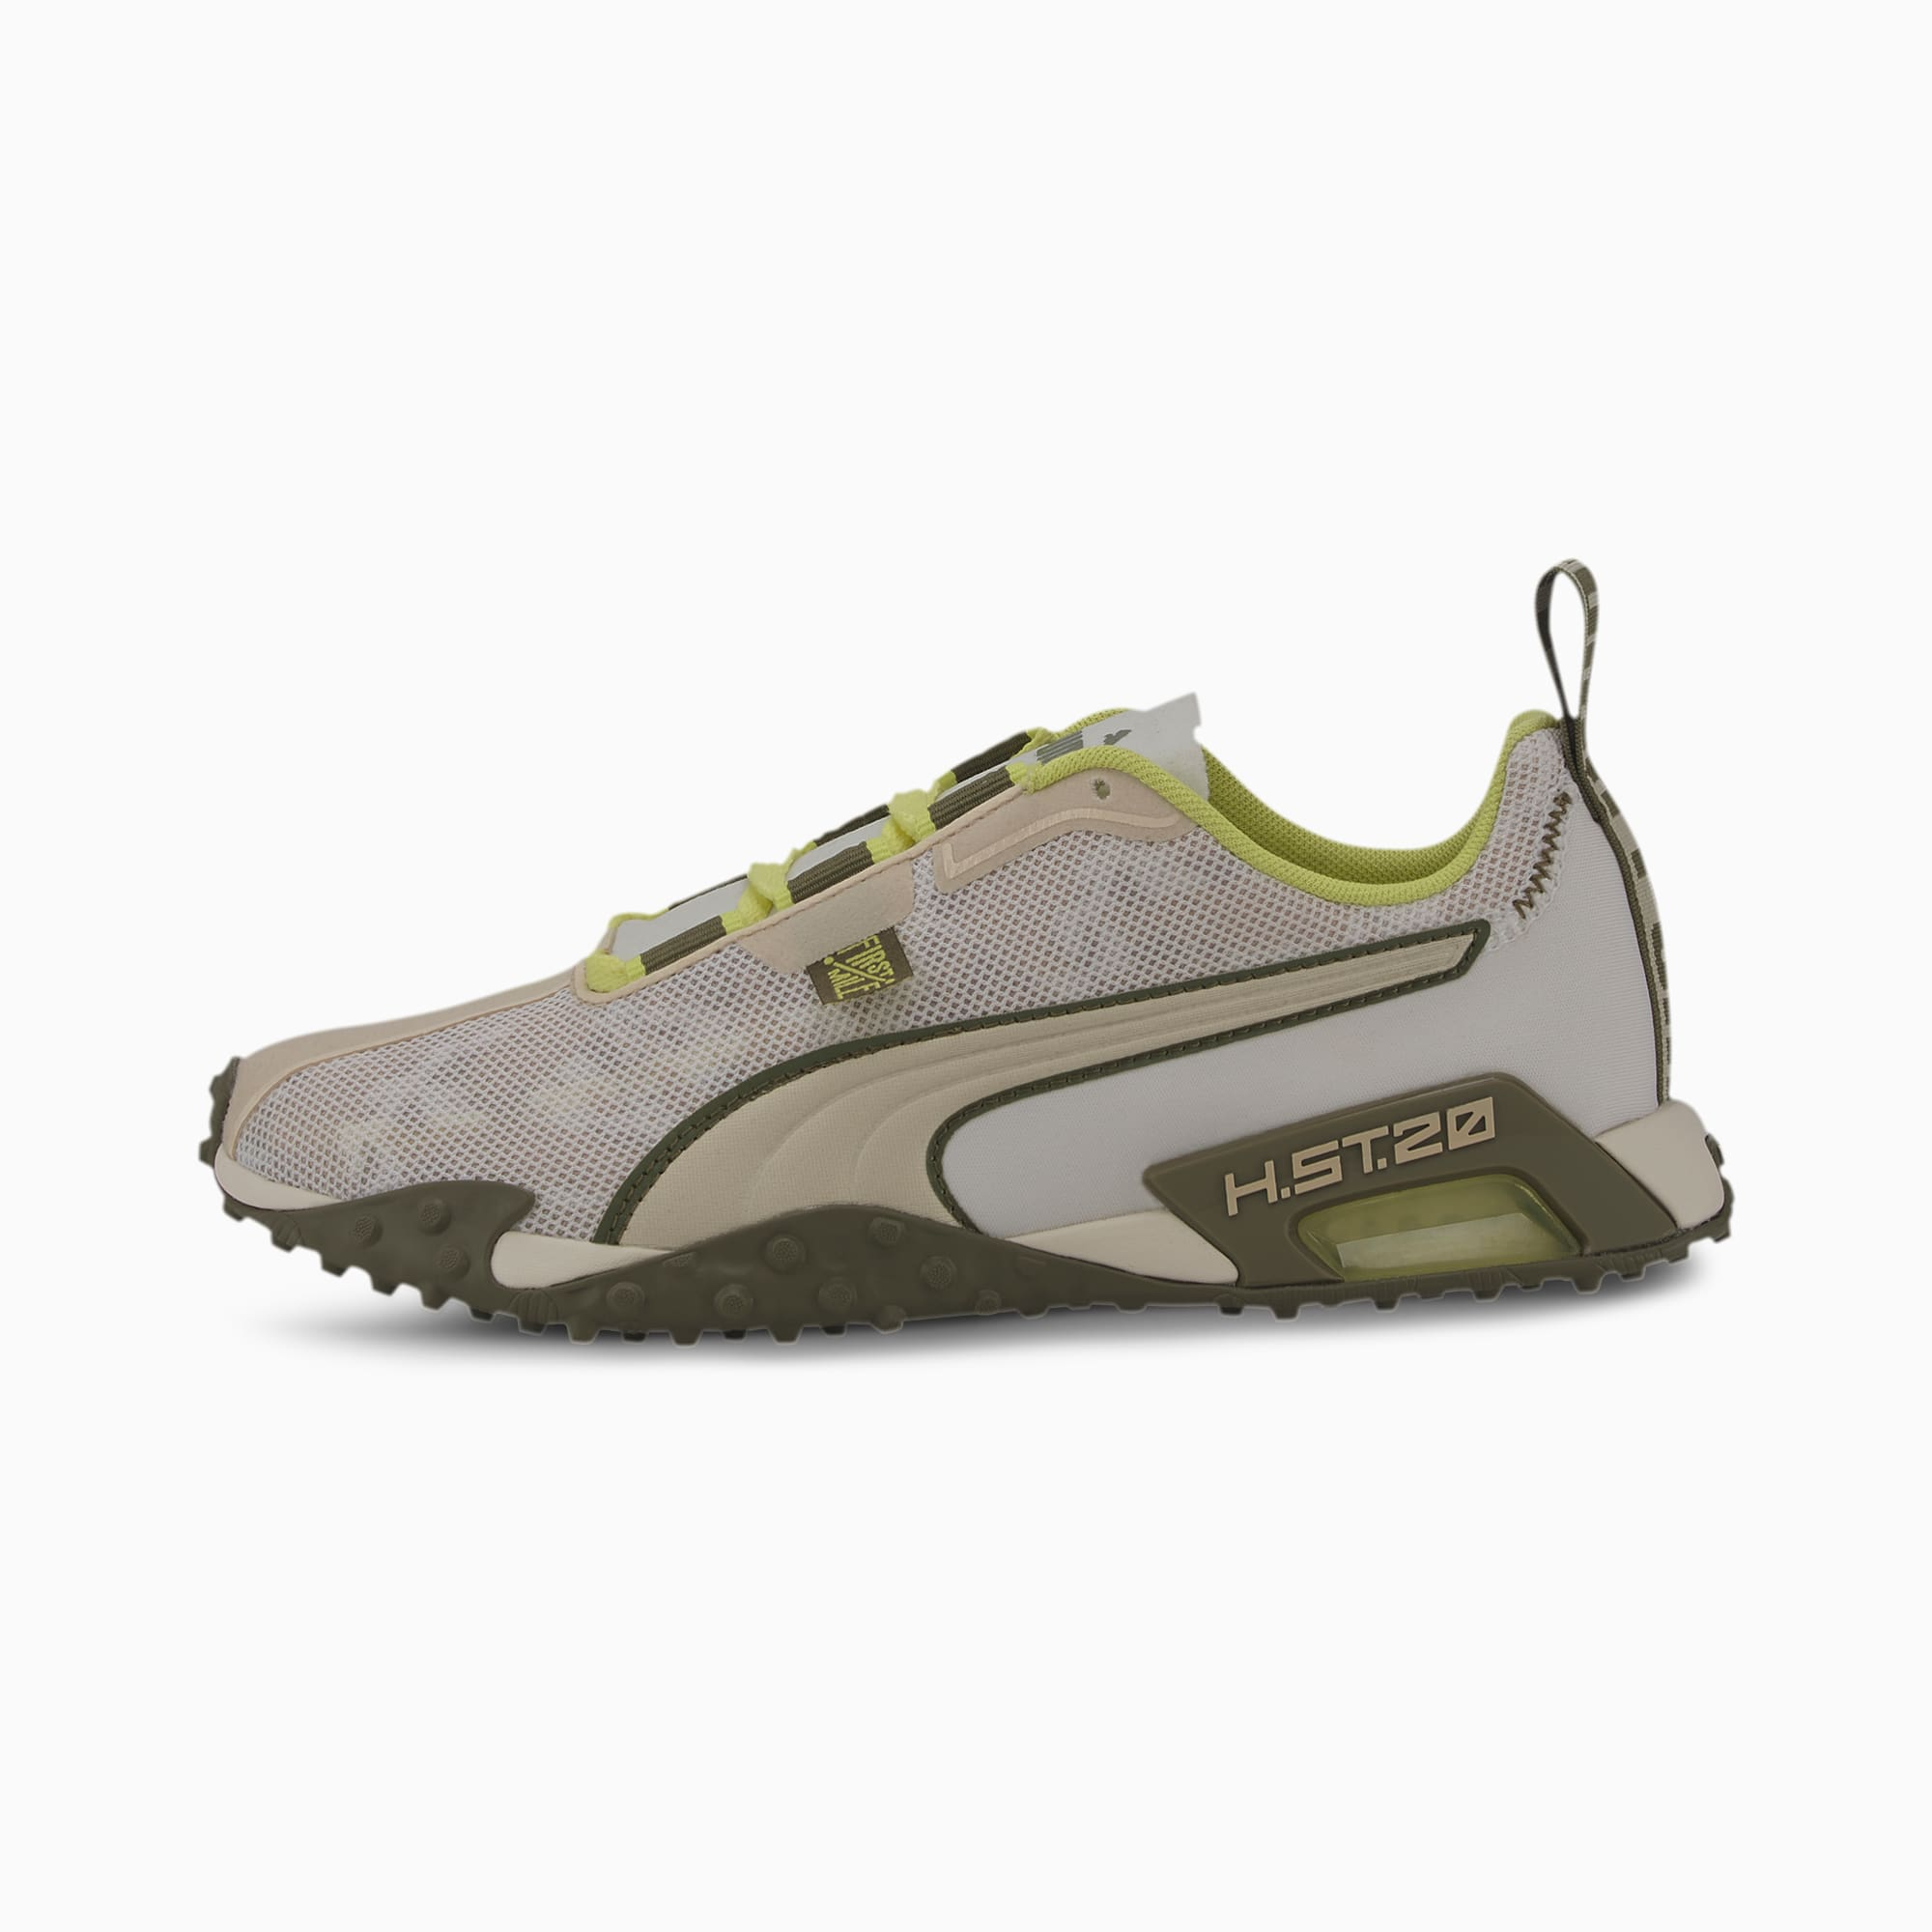 Puma X First Mile H St 20 Women S Running Shoes Puma White Tapioca Puma Shoes Puma